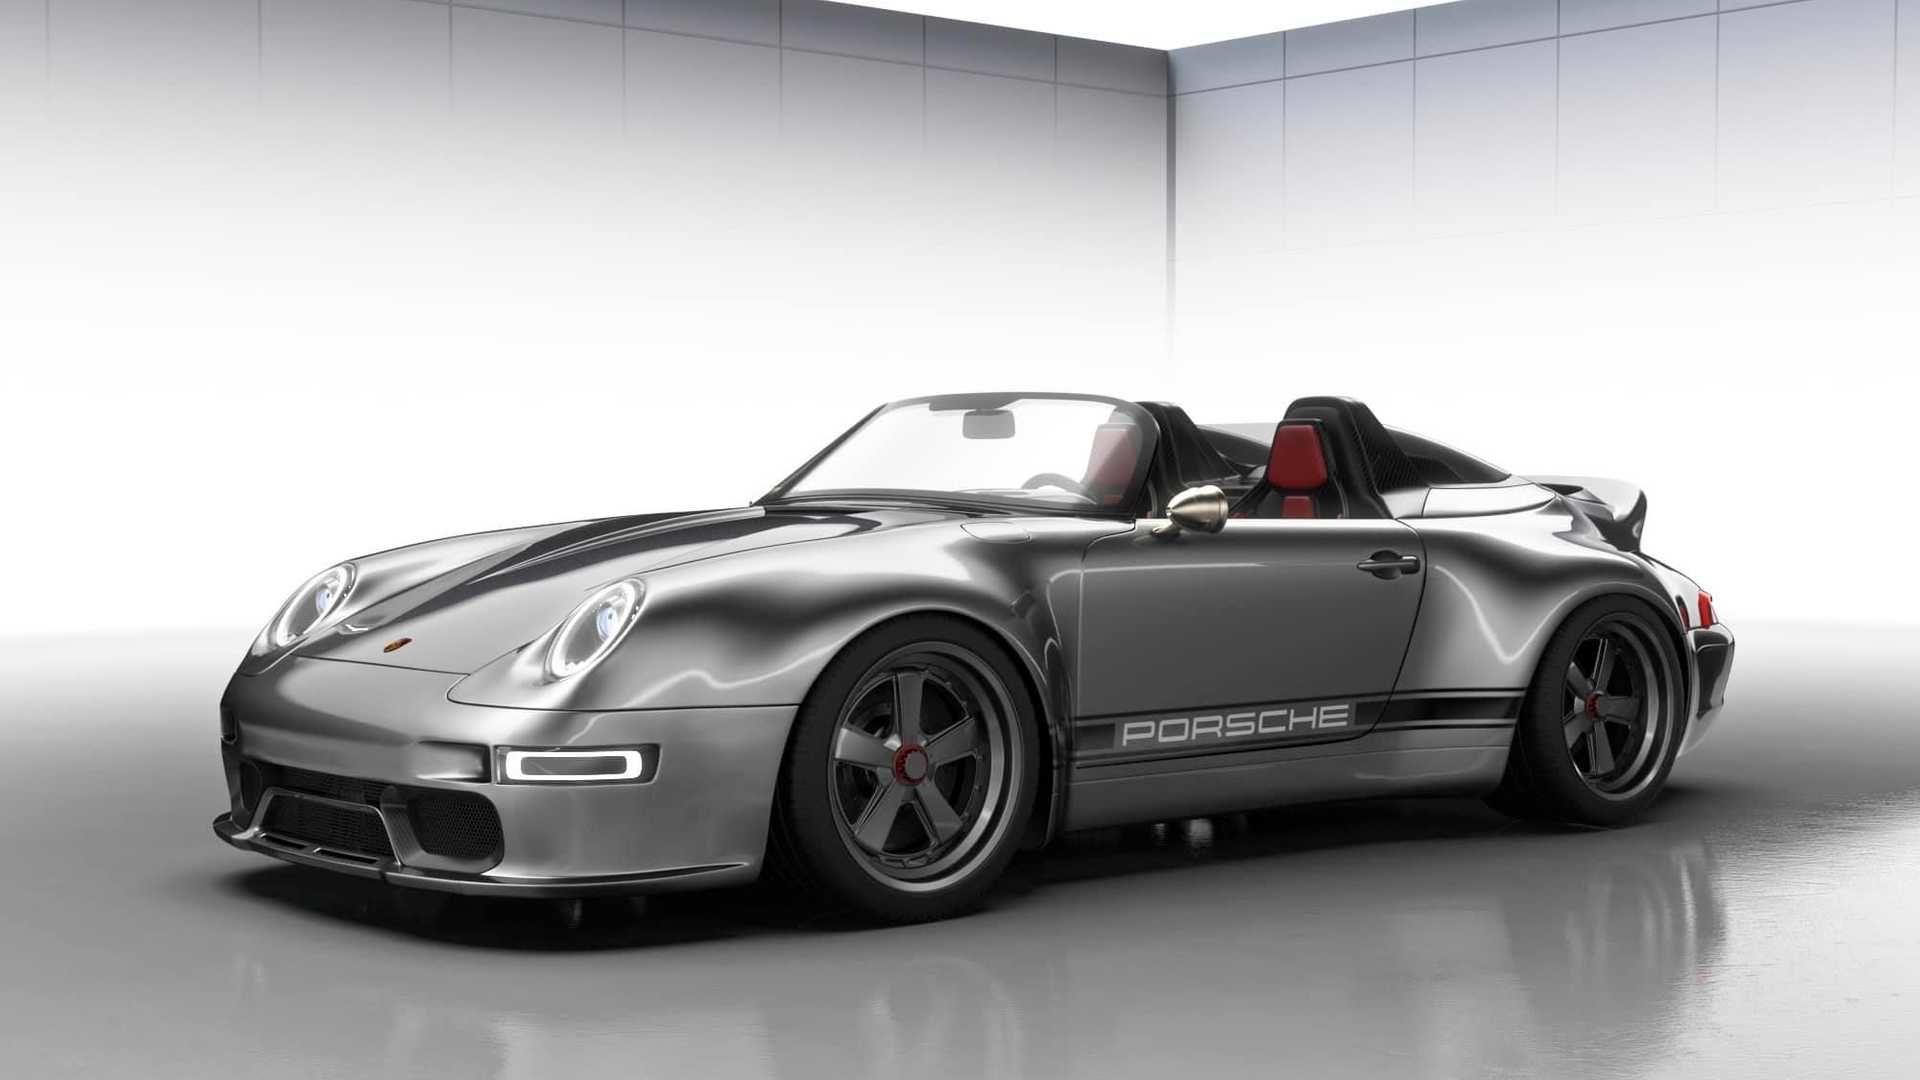 Gunther Werks 推出超驚豔的 Porsche 911 重度改裝作品「Speedster」